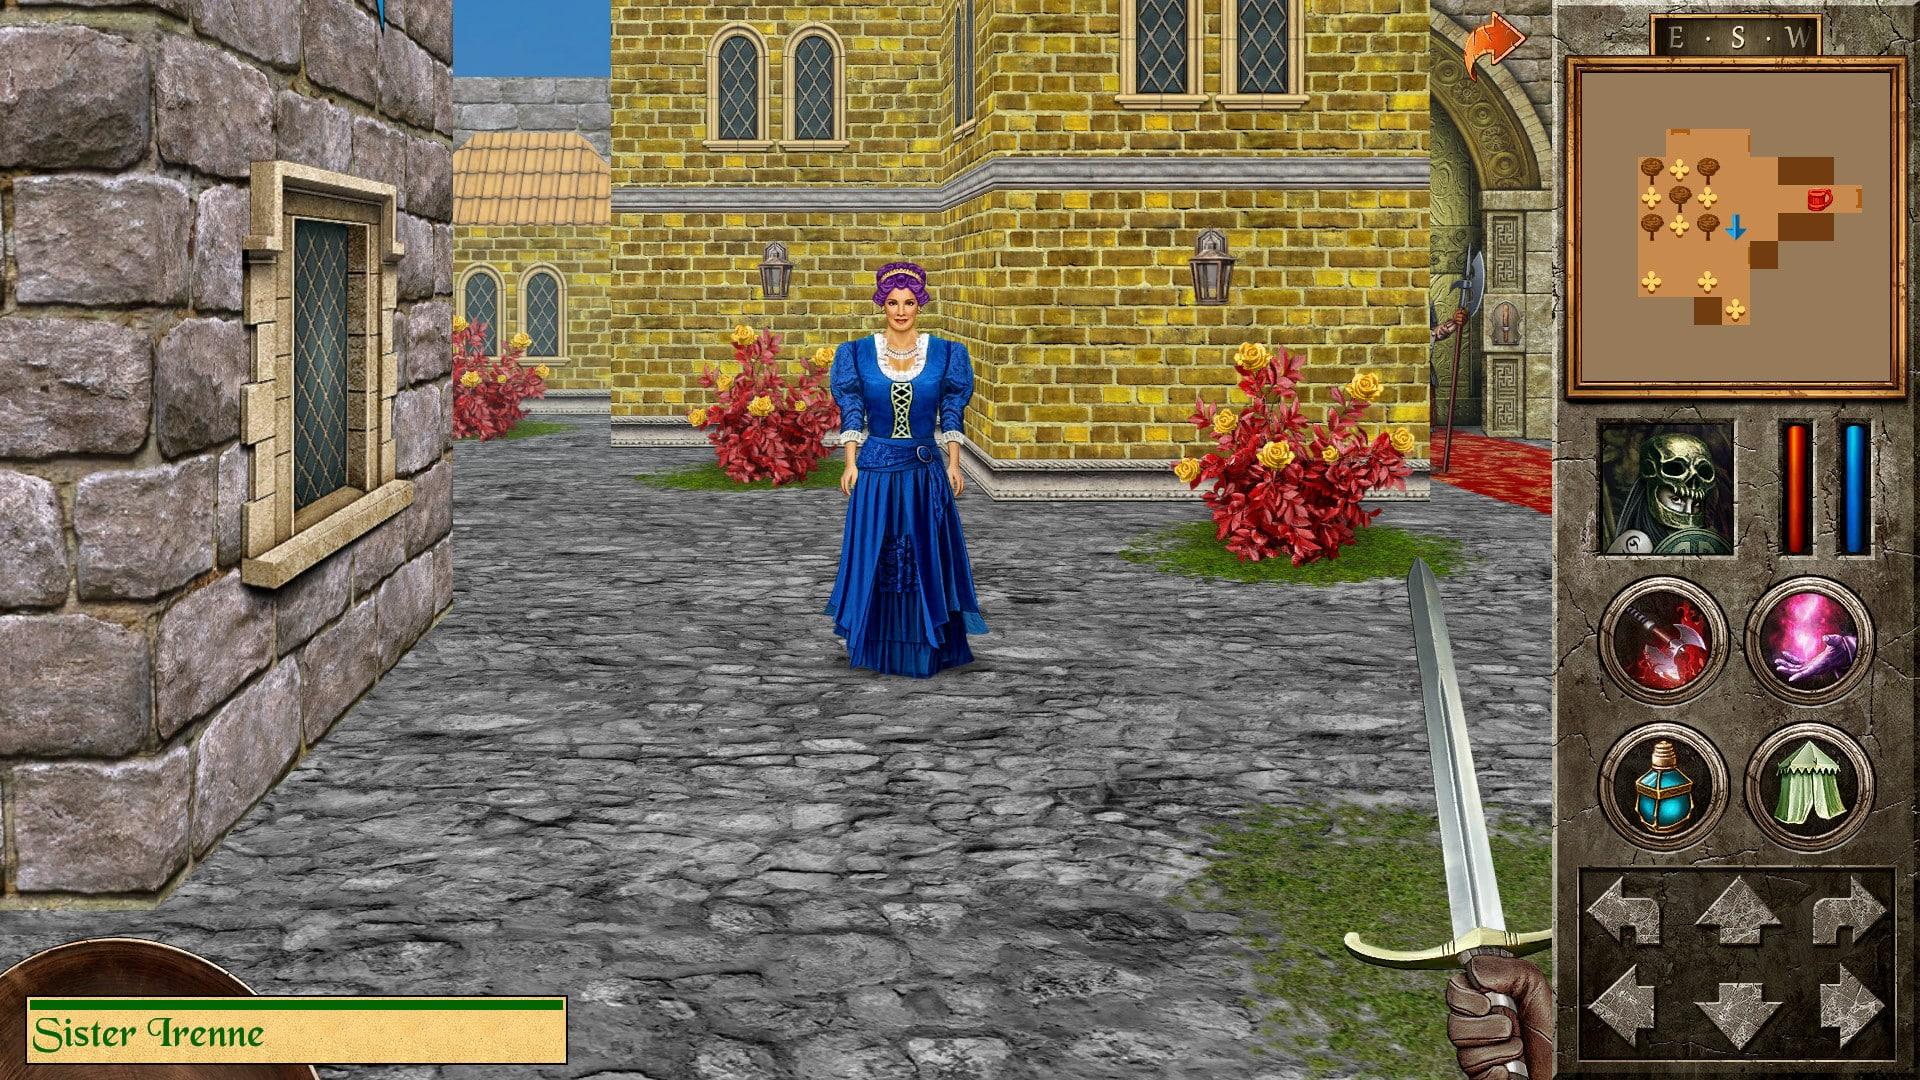 The Quest Screenshot 1